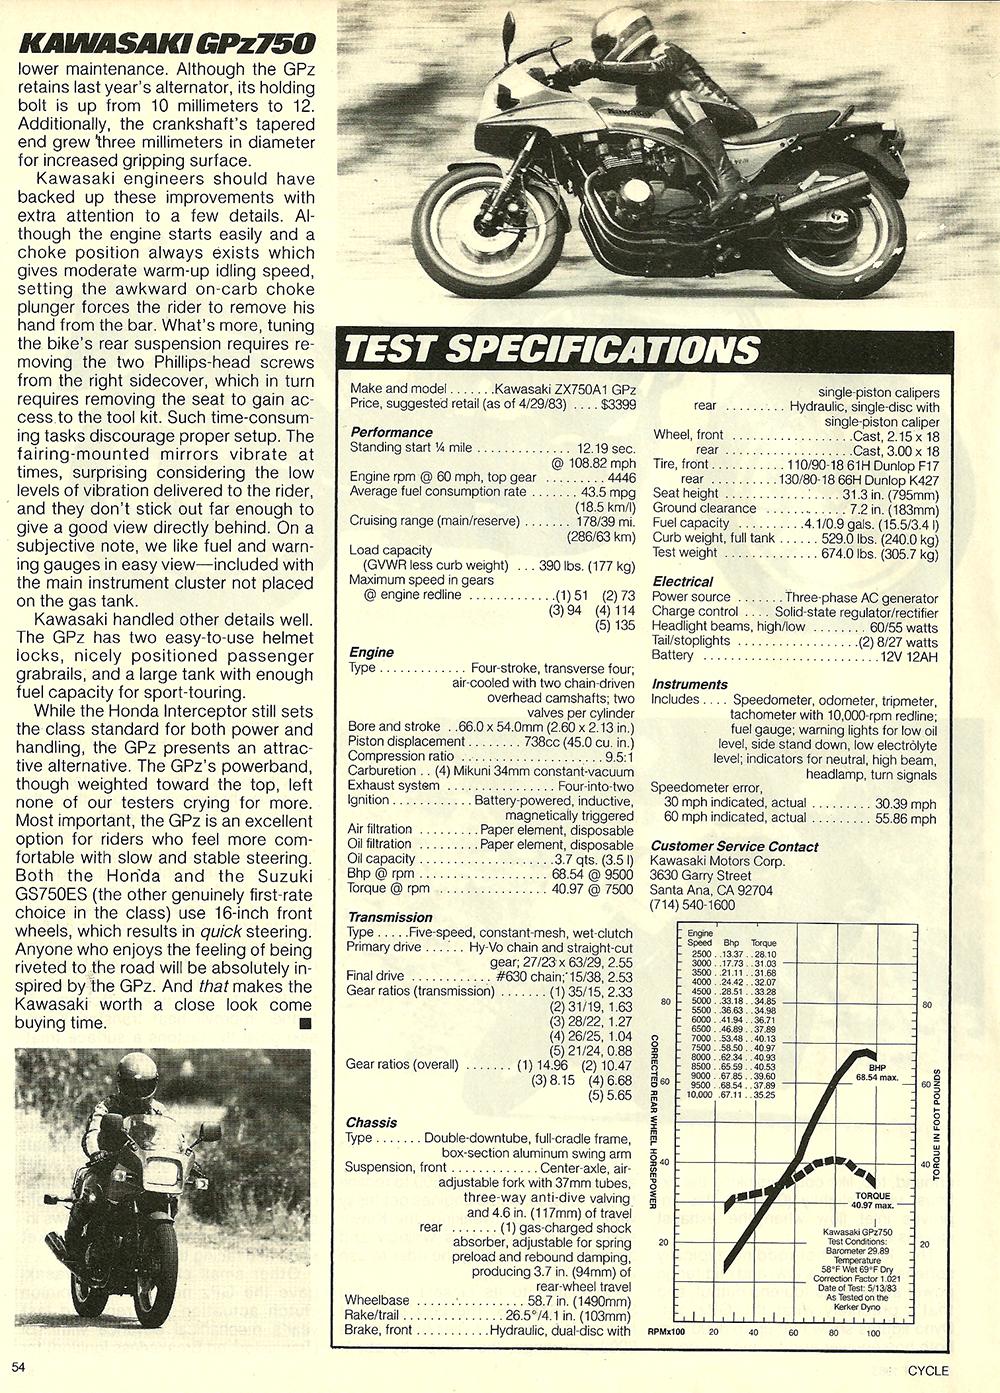 1983 Kawasaki GPz 750 road test 7.jpg